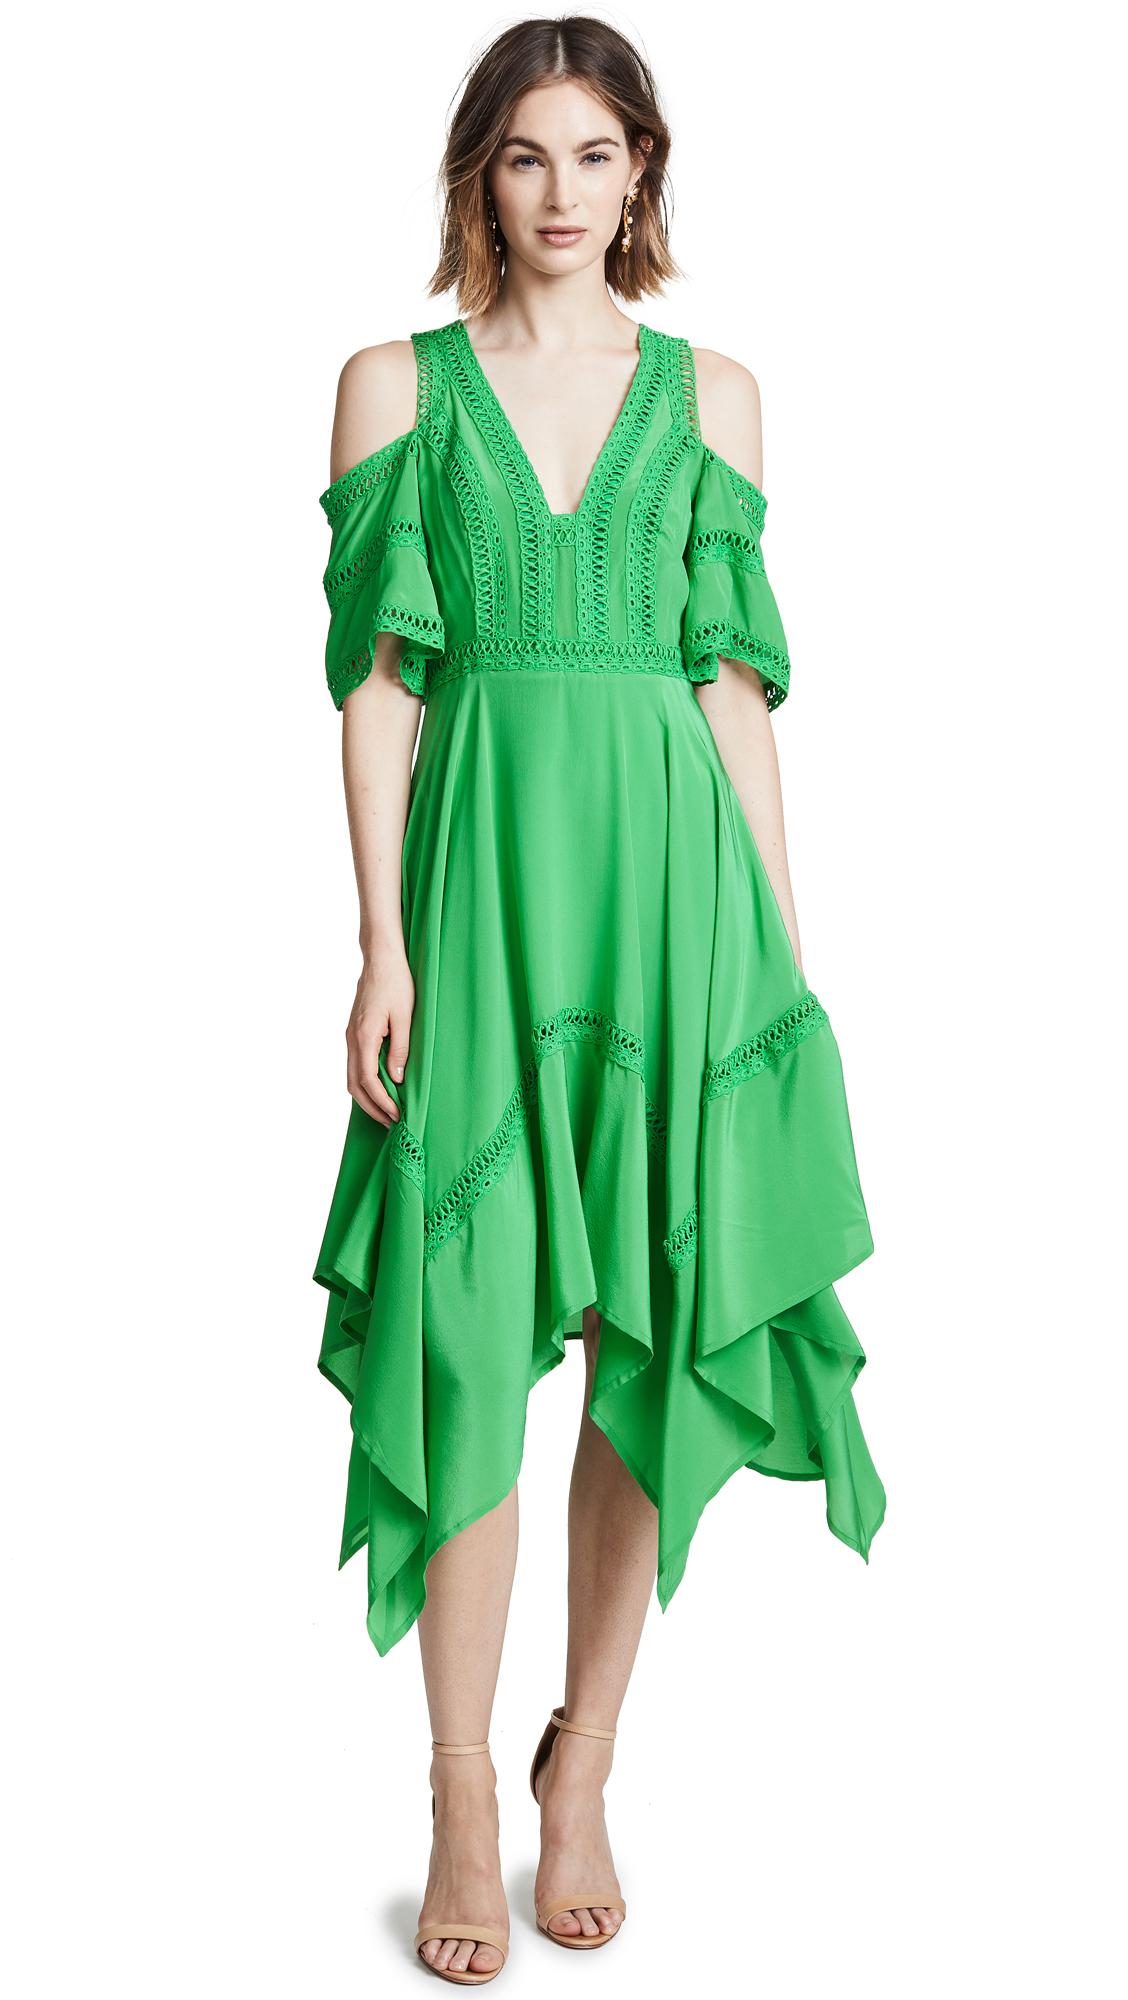 THURLEY Cold Shoulder Dress - Kelly Green